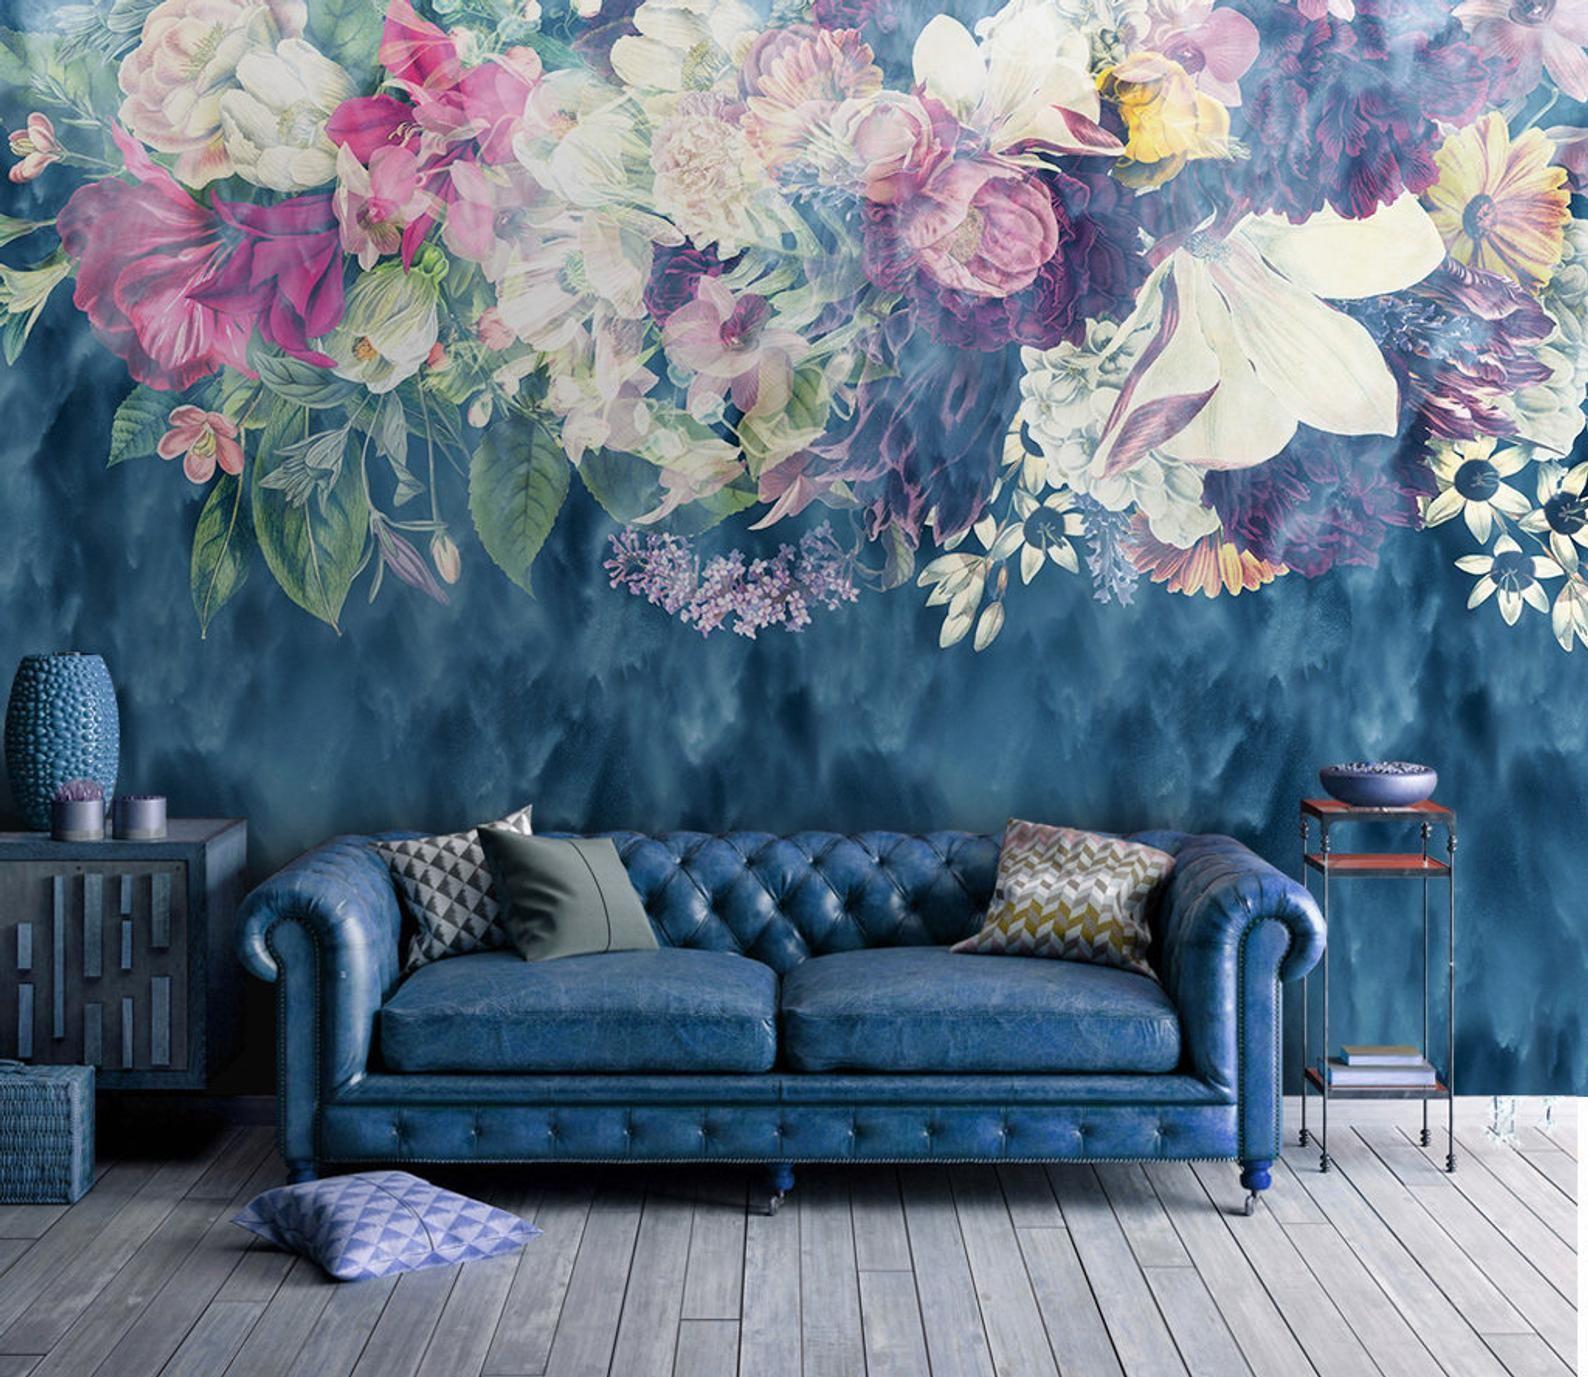 Floral Wallpaper Vintage Abstract Rose Flower Wallpaper Bed